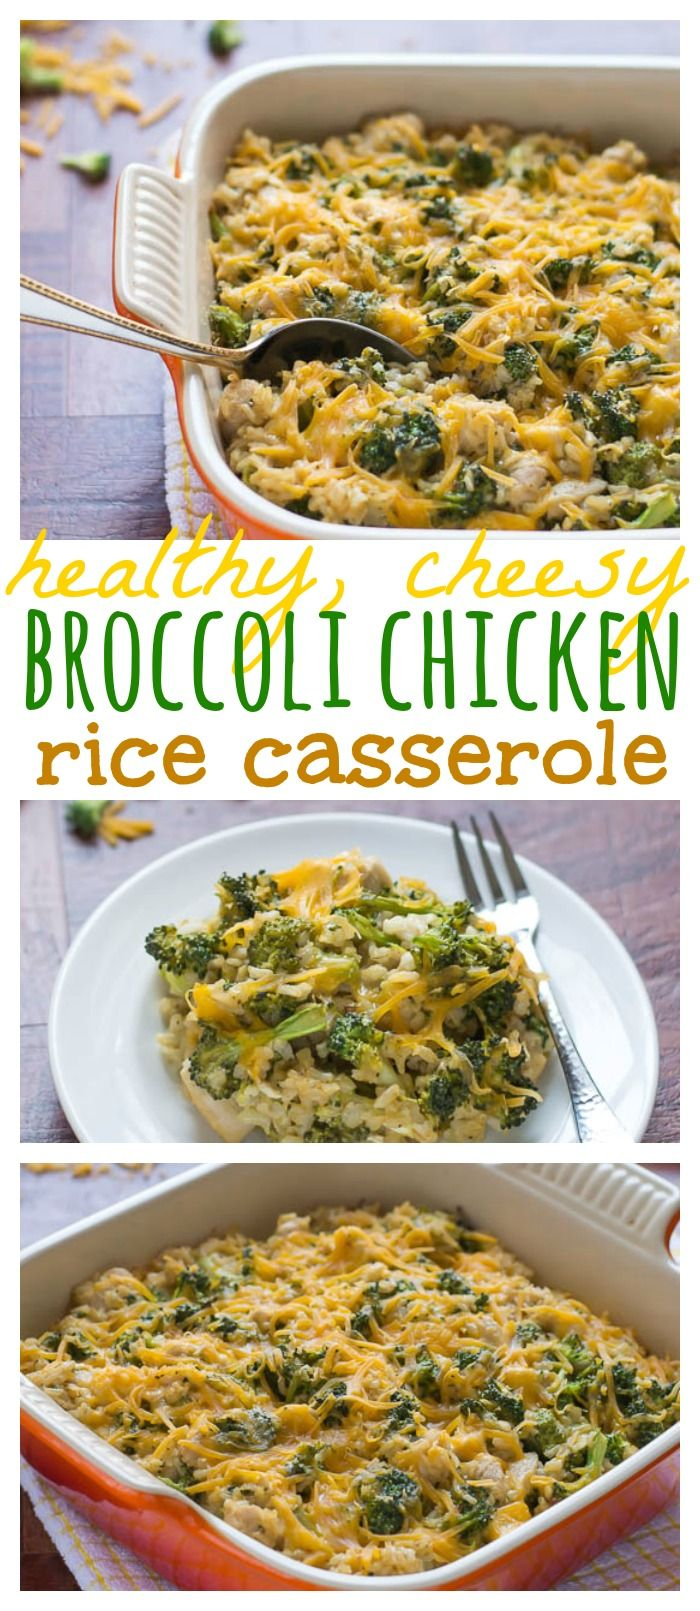 Healthy, Cheesy Broccoli Chicken Rice Casserole  Well -3460